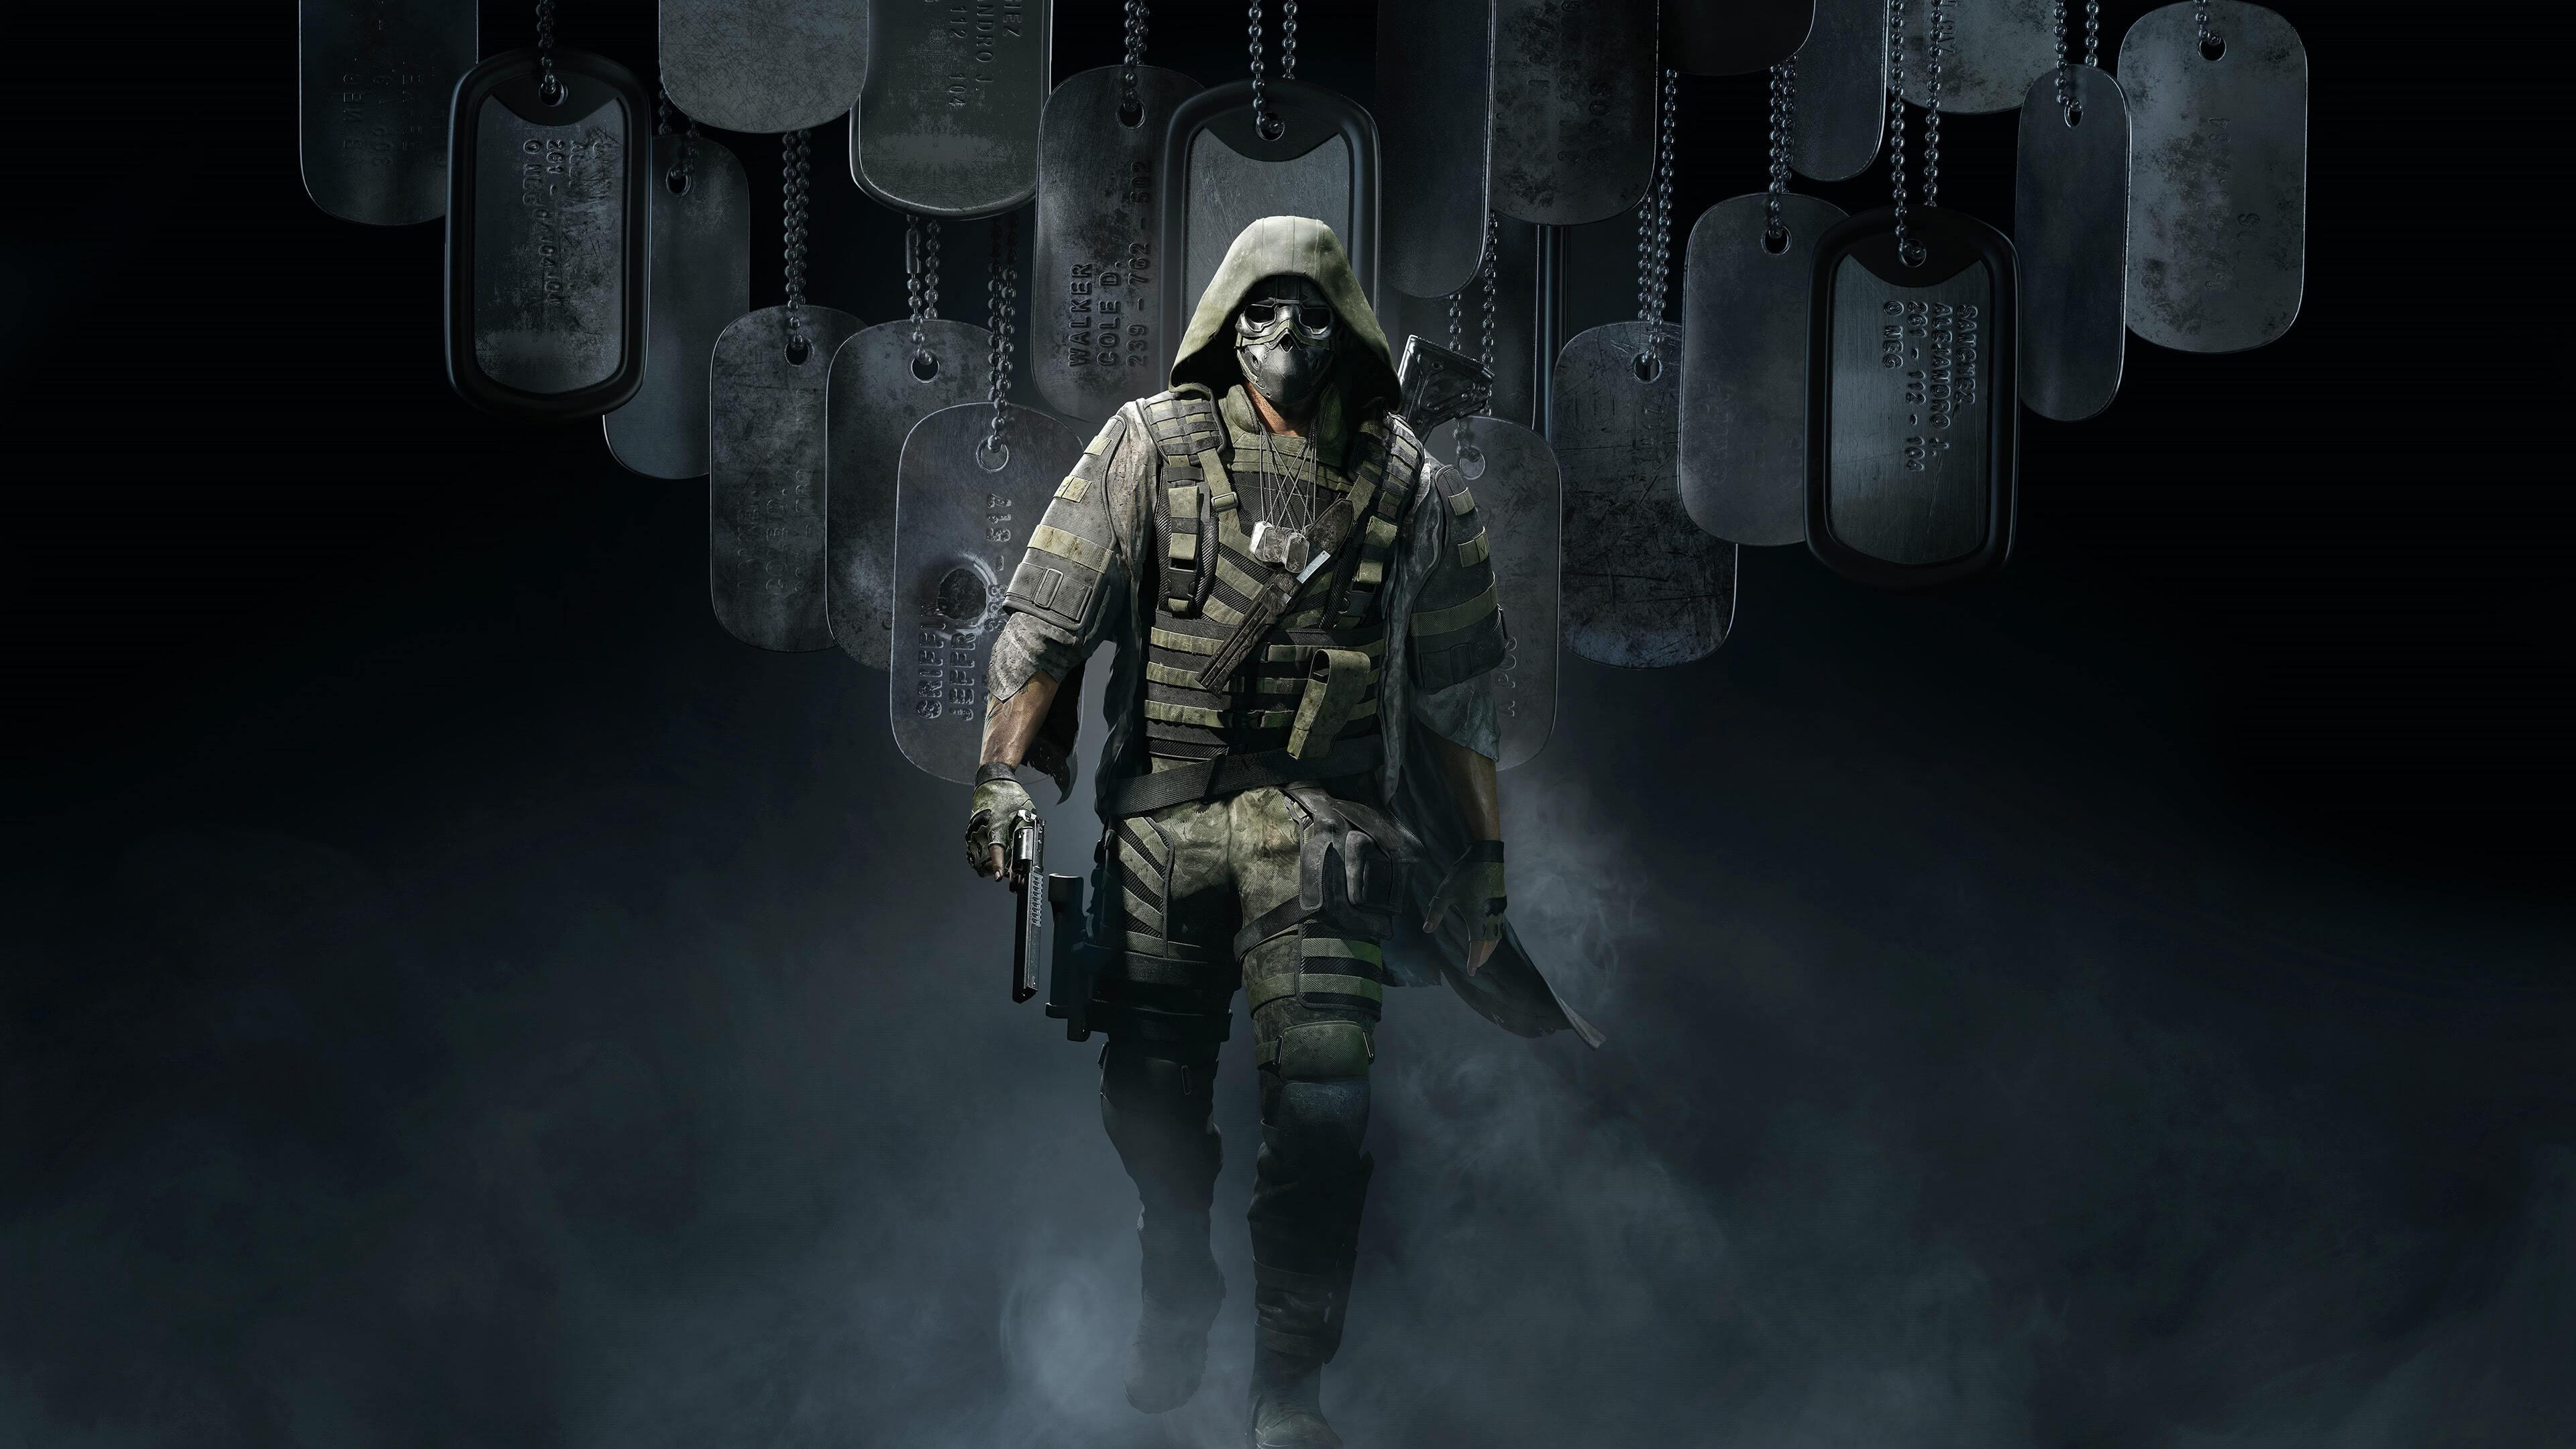 Tom Clancys Ghost Recon Breakpoint Uhd 4k Wallpaper Pixelz